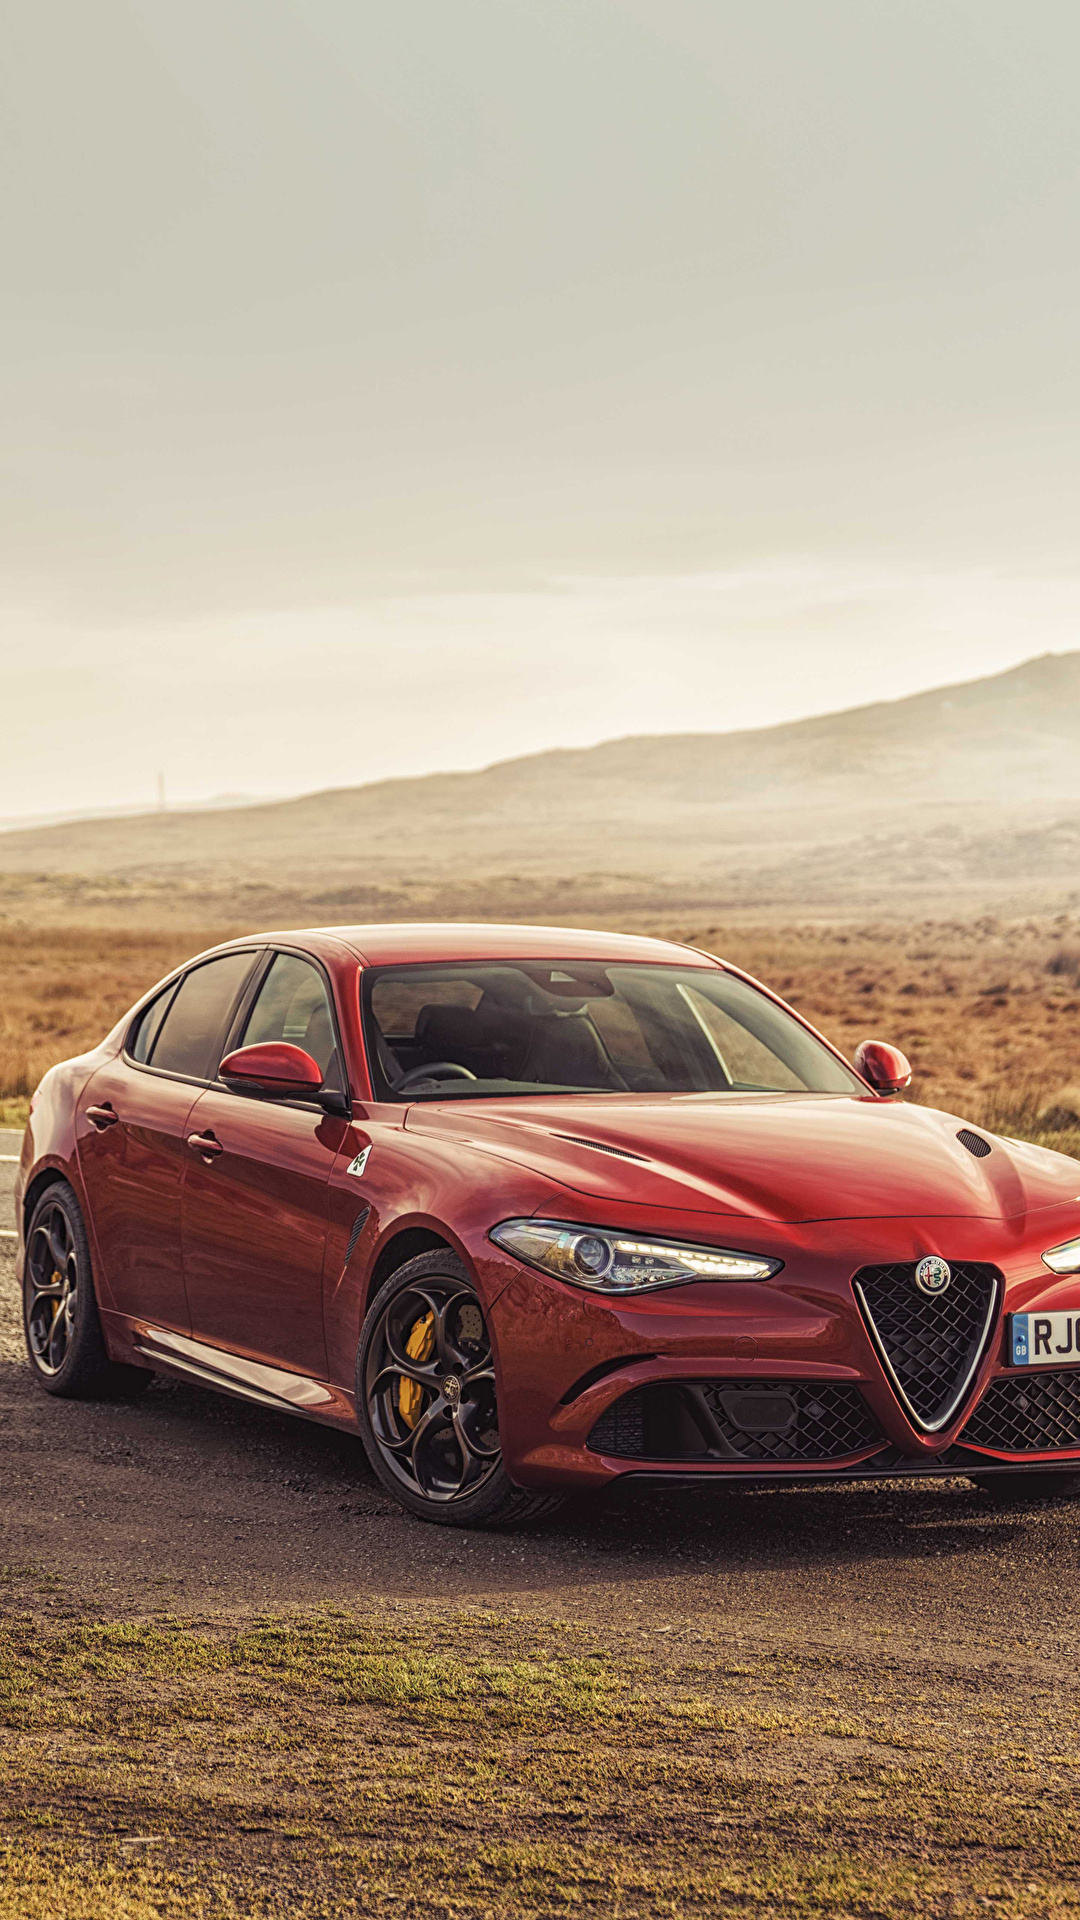 Image Alfa Romeo 2016 17 Giulia Quadrifoglio Red 1080x1920